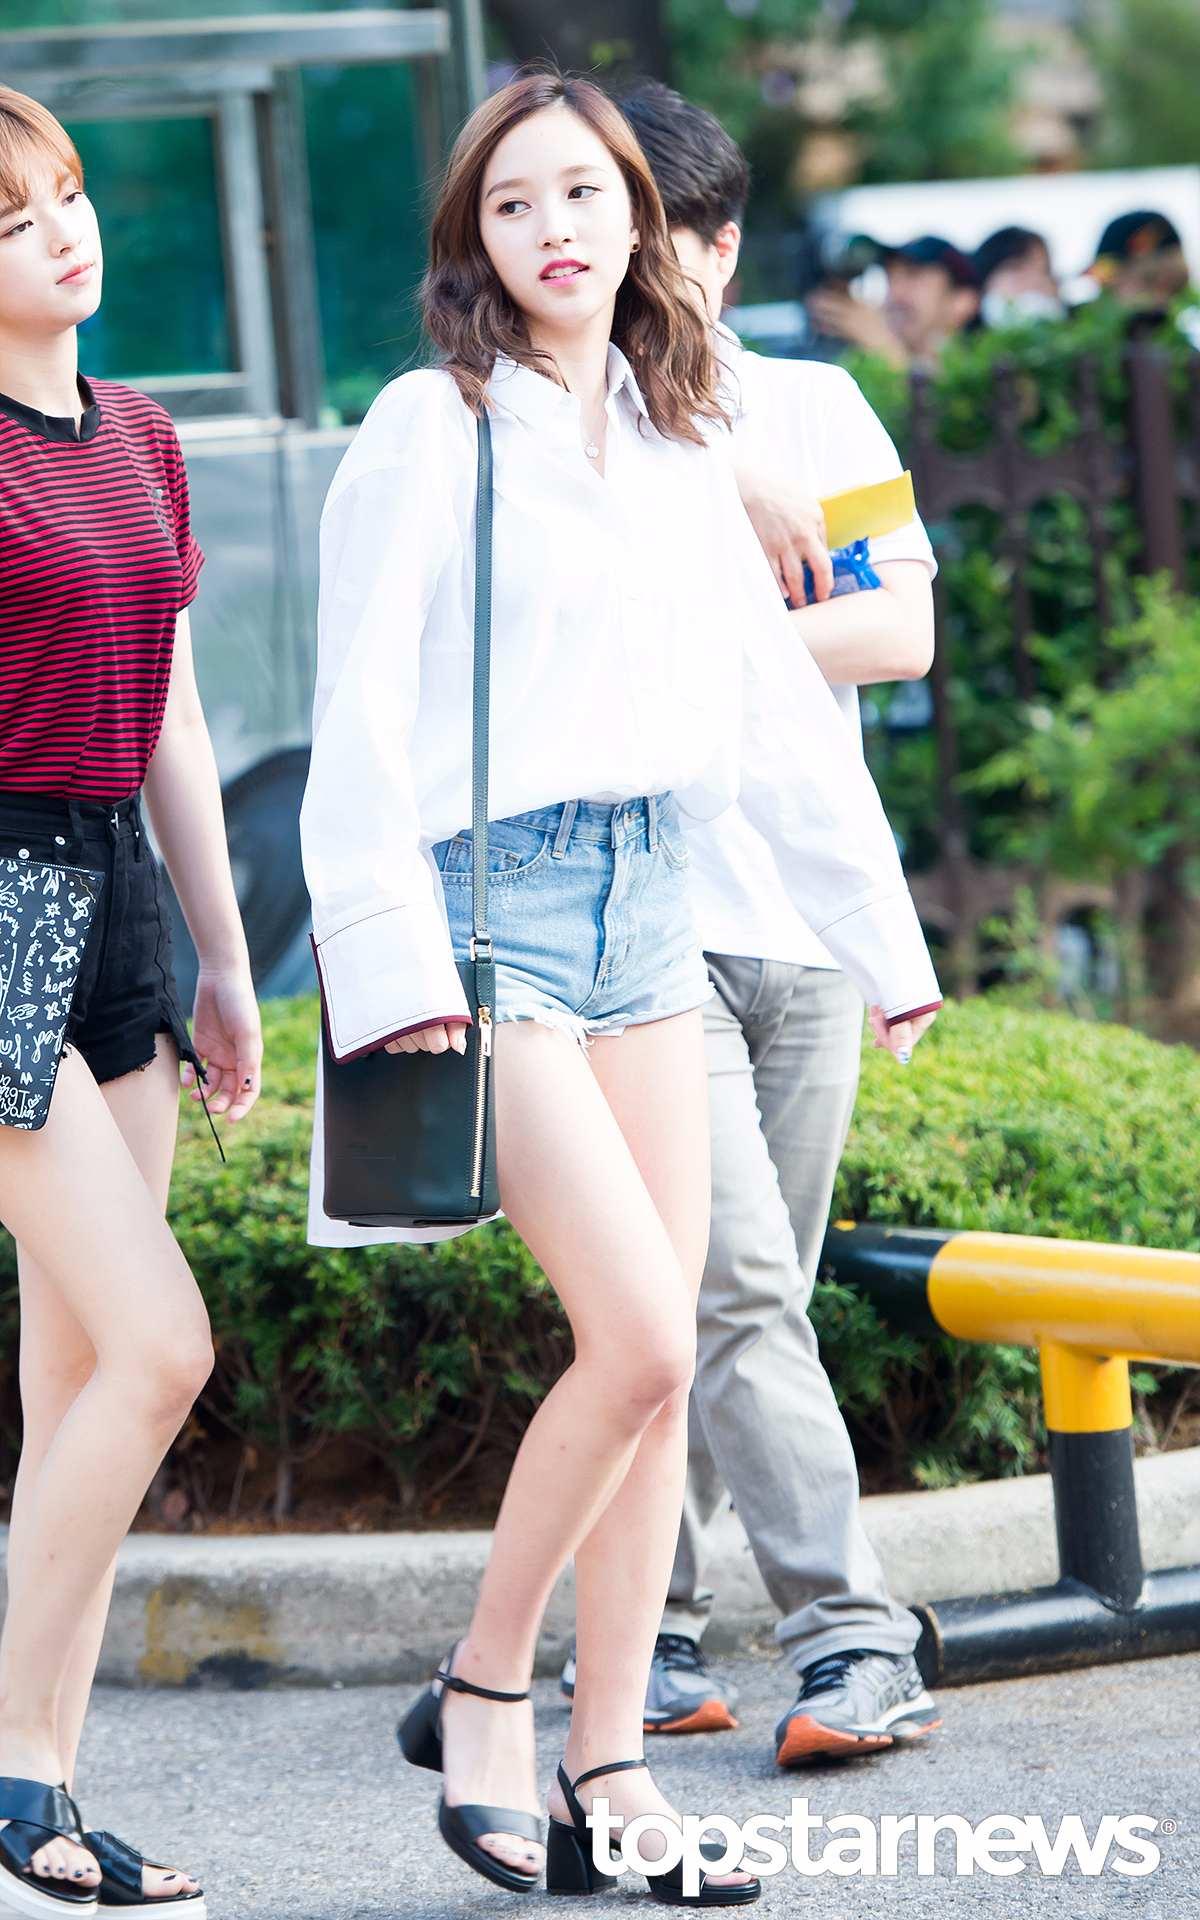 ♡Mina 首先跟女孩們分享的是Mina的輕熟造型,從髮型到穿搭,Mina一直都是走輕熟風,Mina的私服中真的很少穿休閒T,基本都是偏正式感的襯衫,搭配高跟鞋。